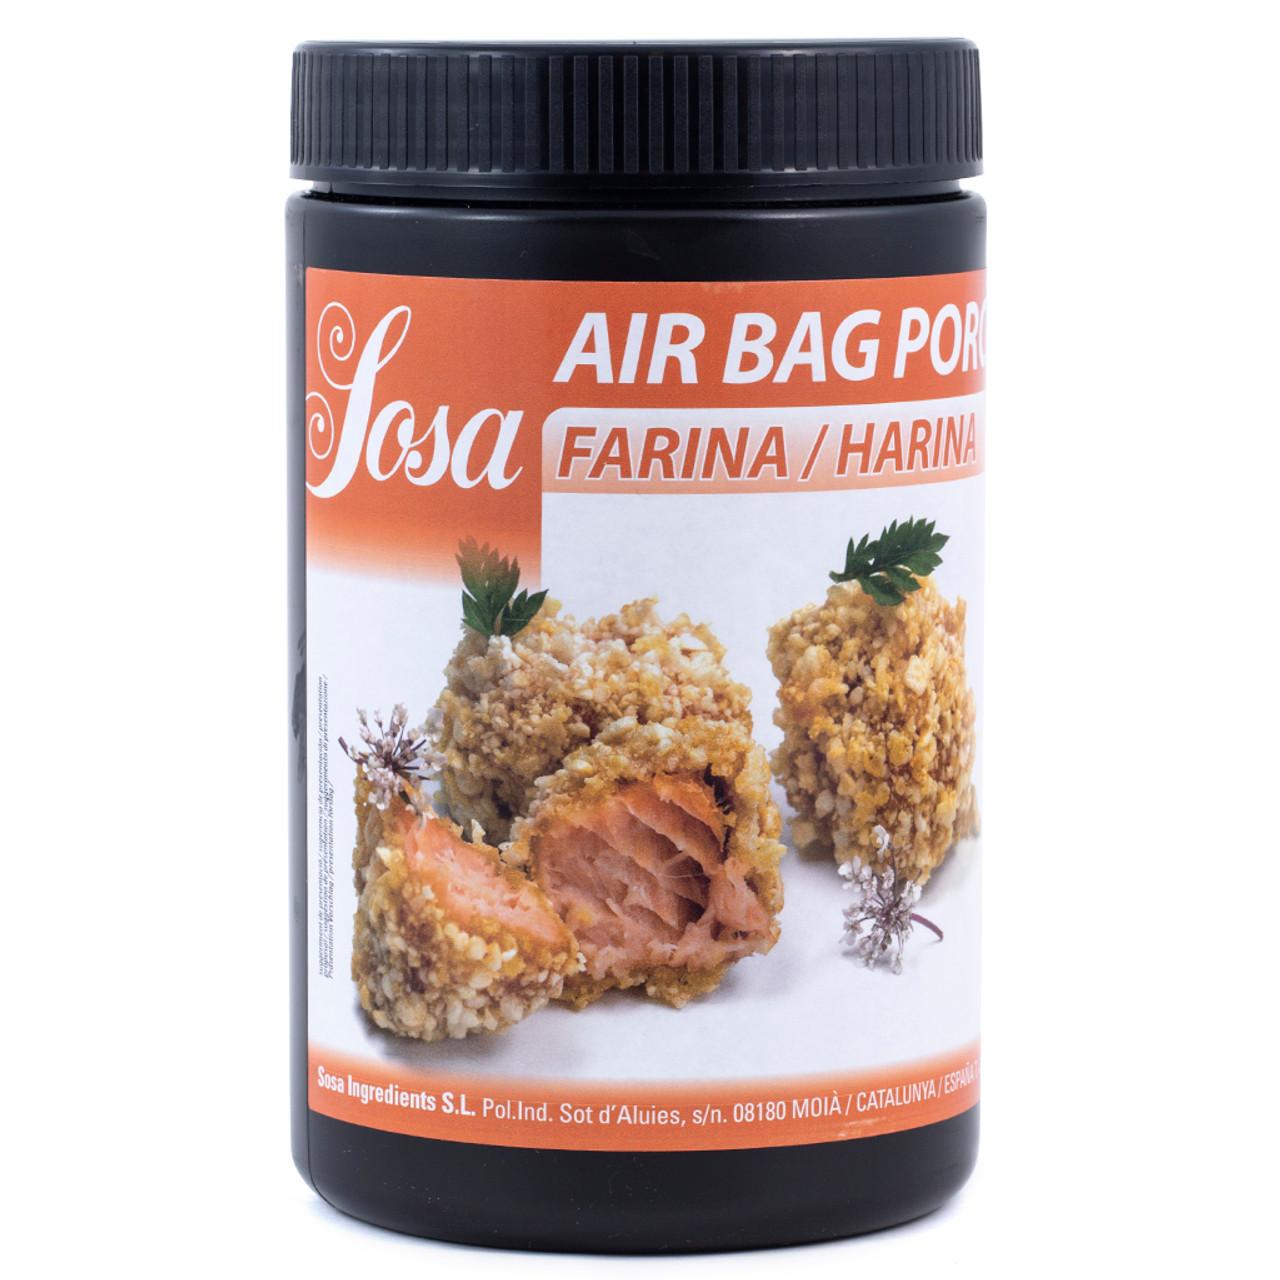 Sosa Airbag Farina Pork (Flour) 600g